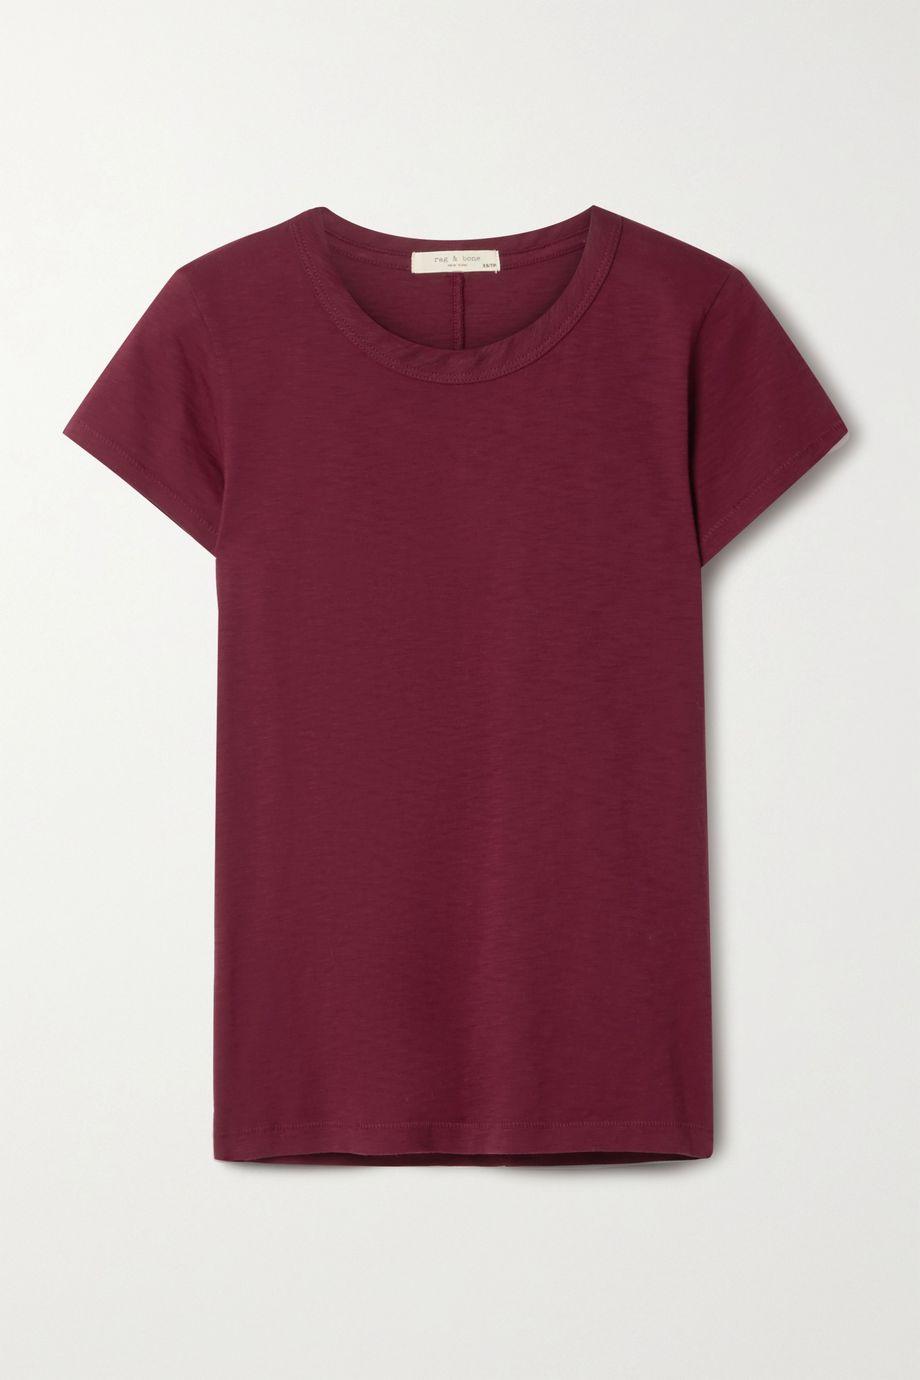 rag & bone The Tee organic Pima cotton-jersey T-shirt